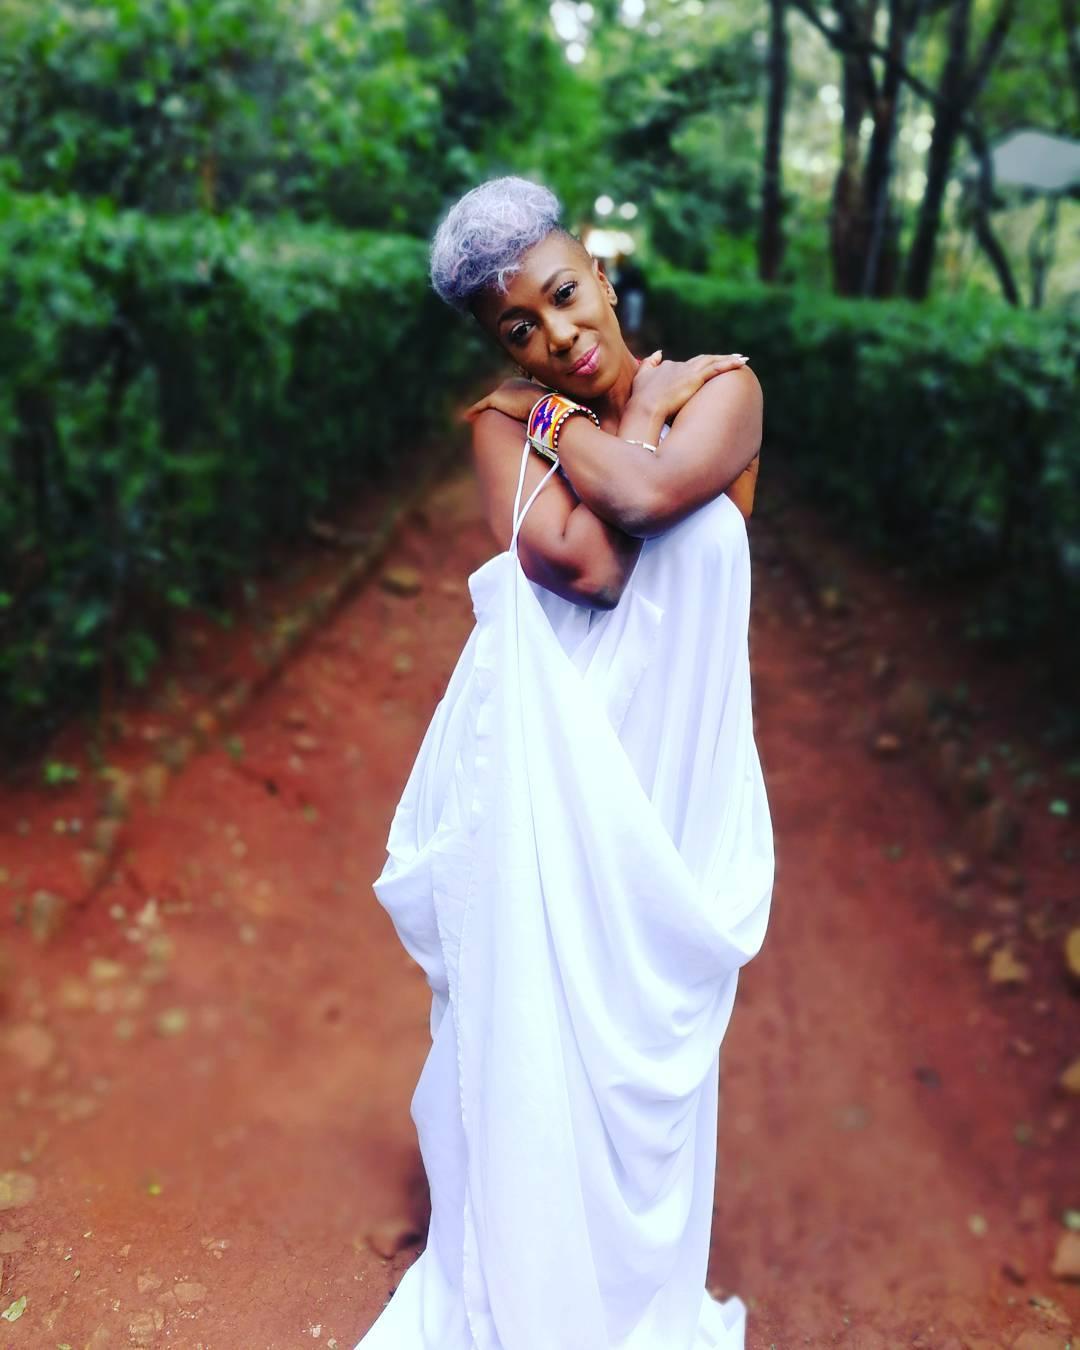 Wahu in white dress